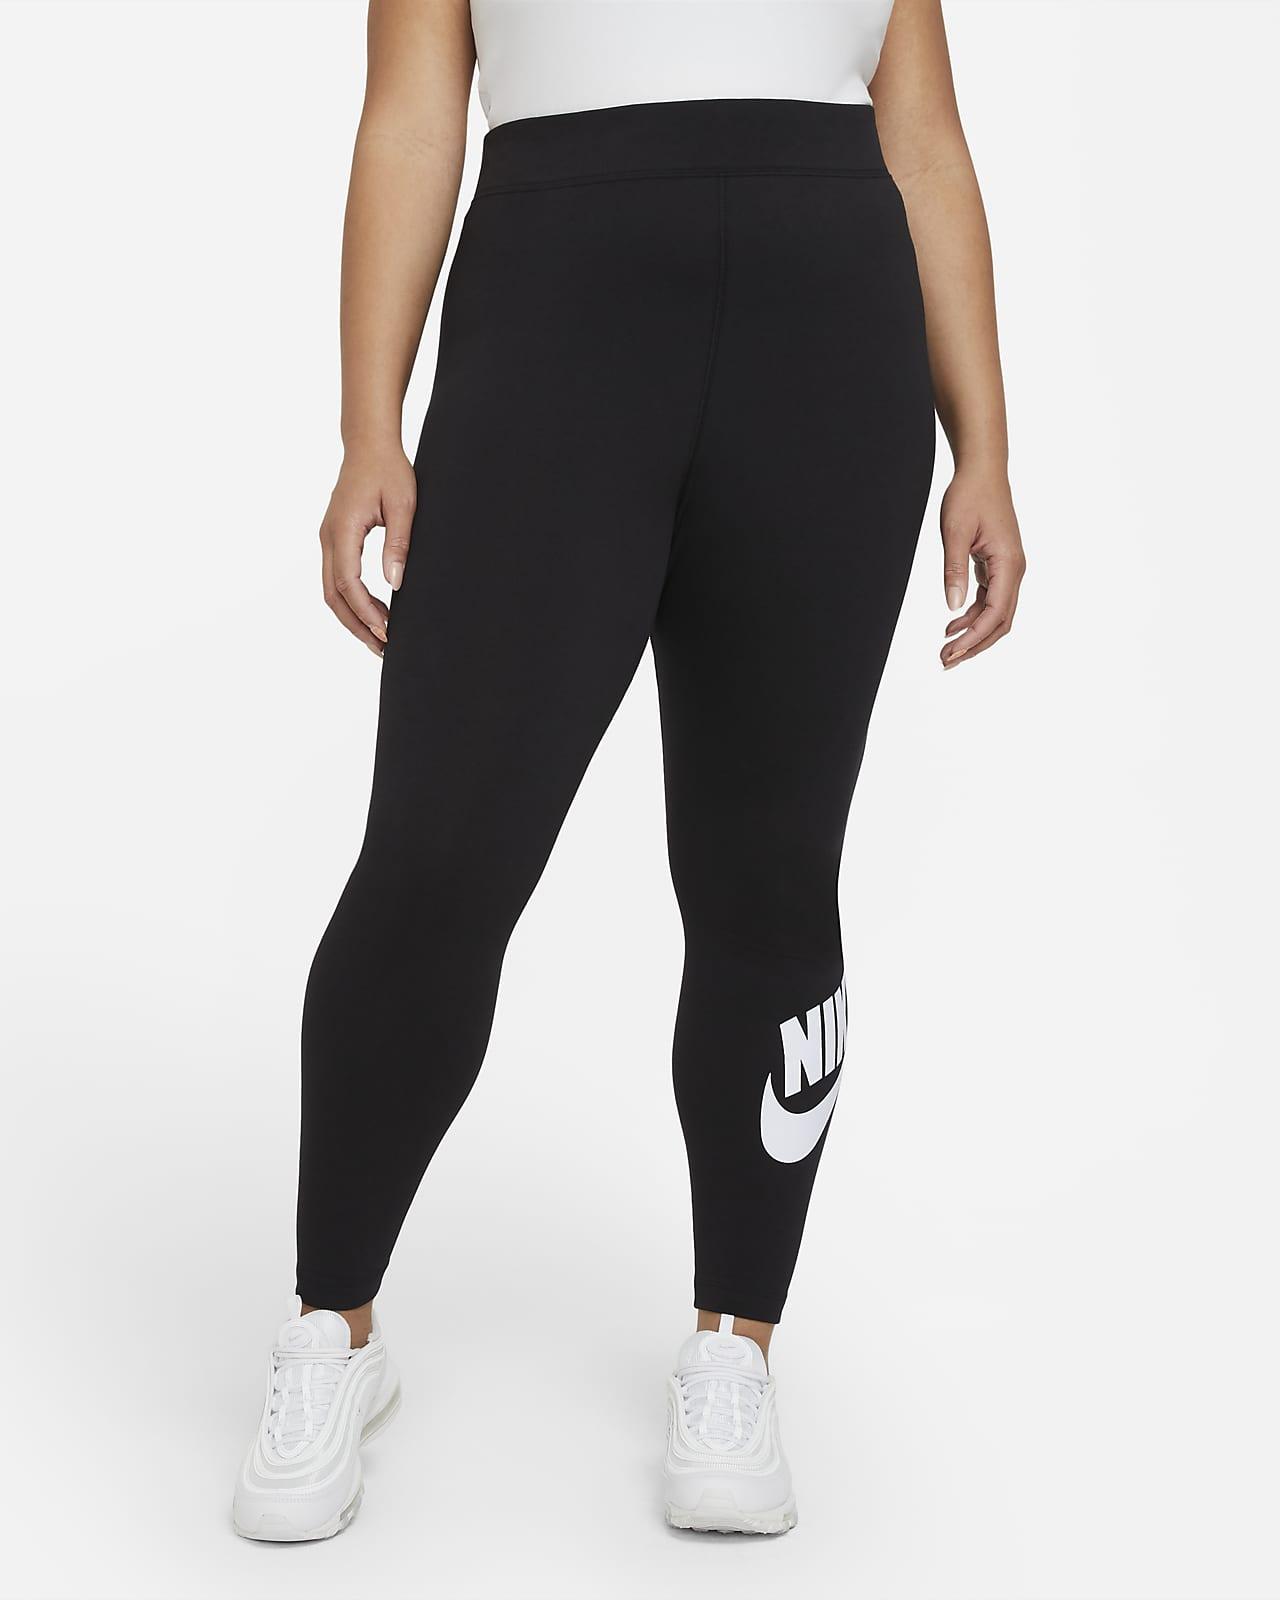 Legging taille haute Nike Sportswear Essential pour Femme (Grande taille)